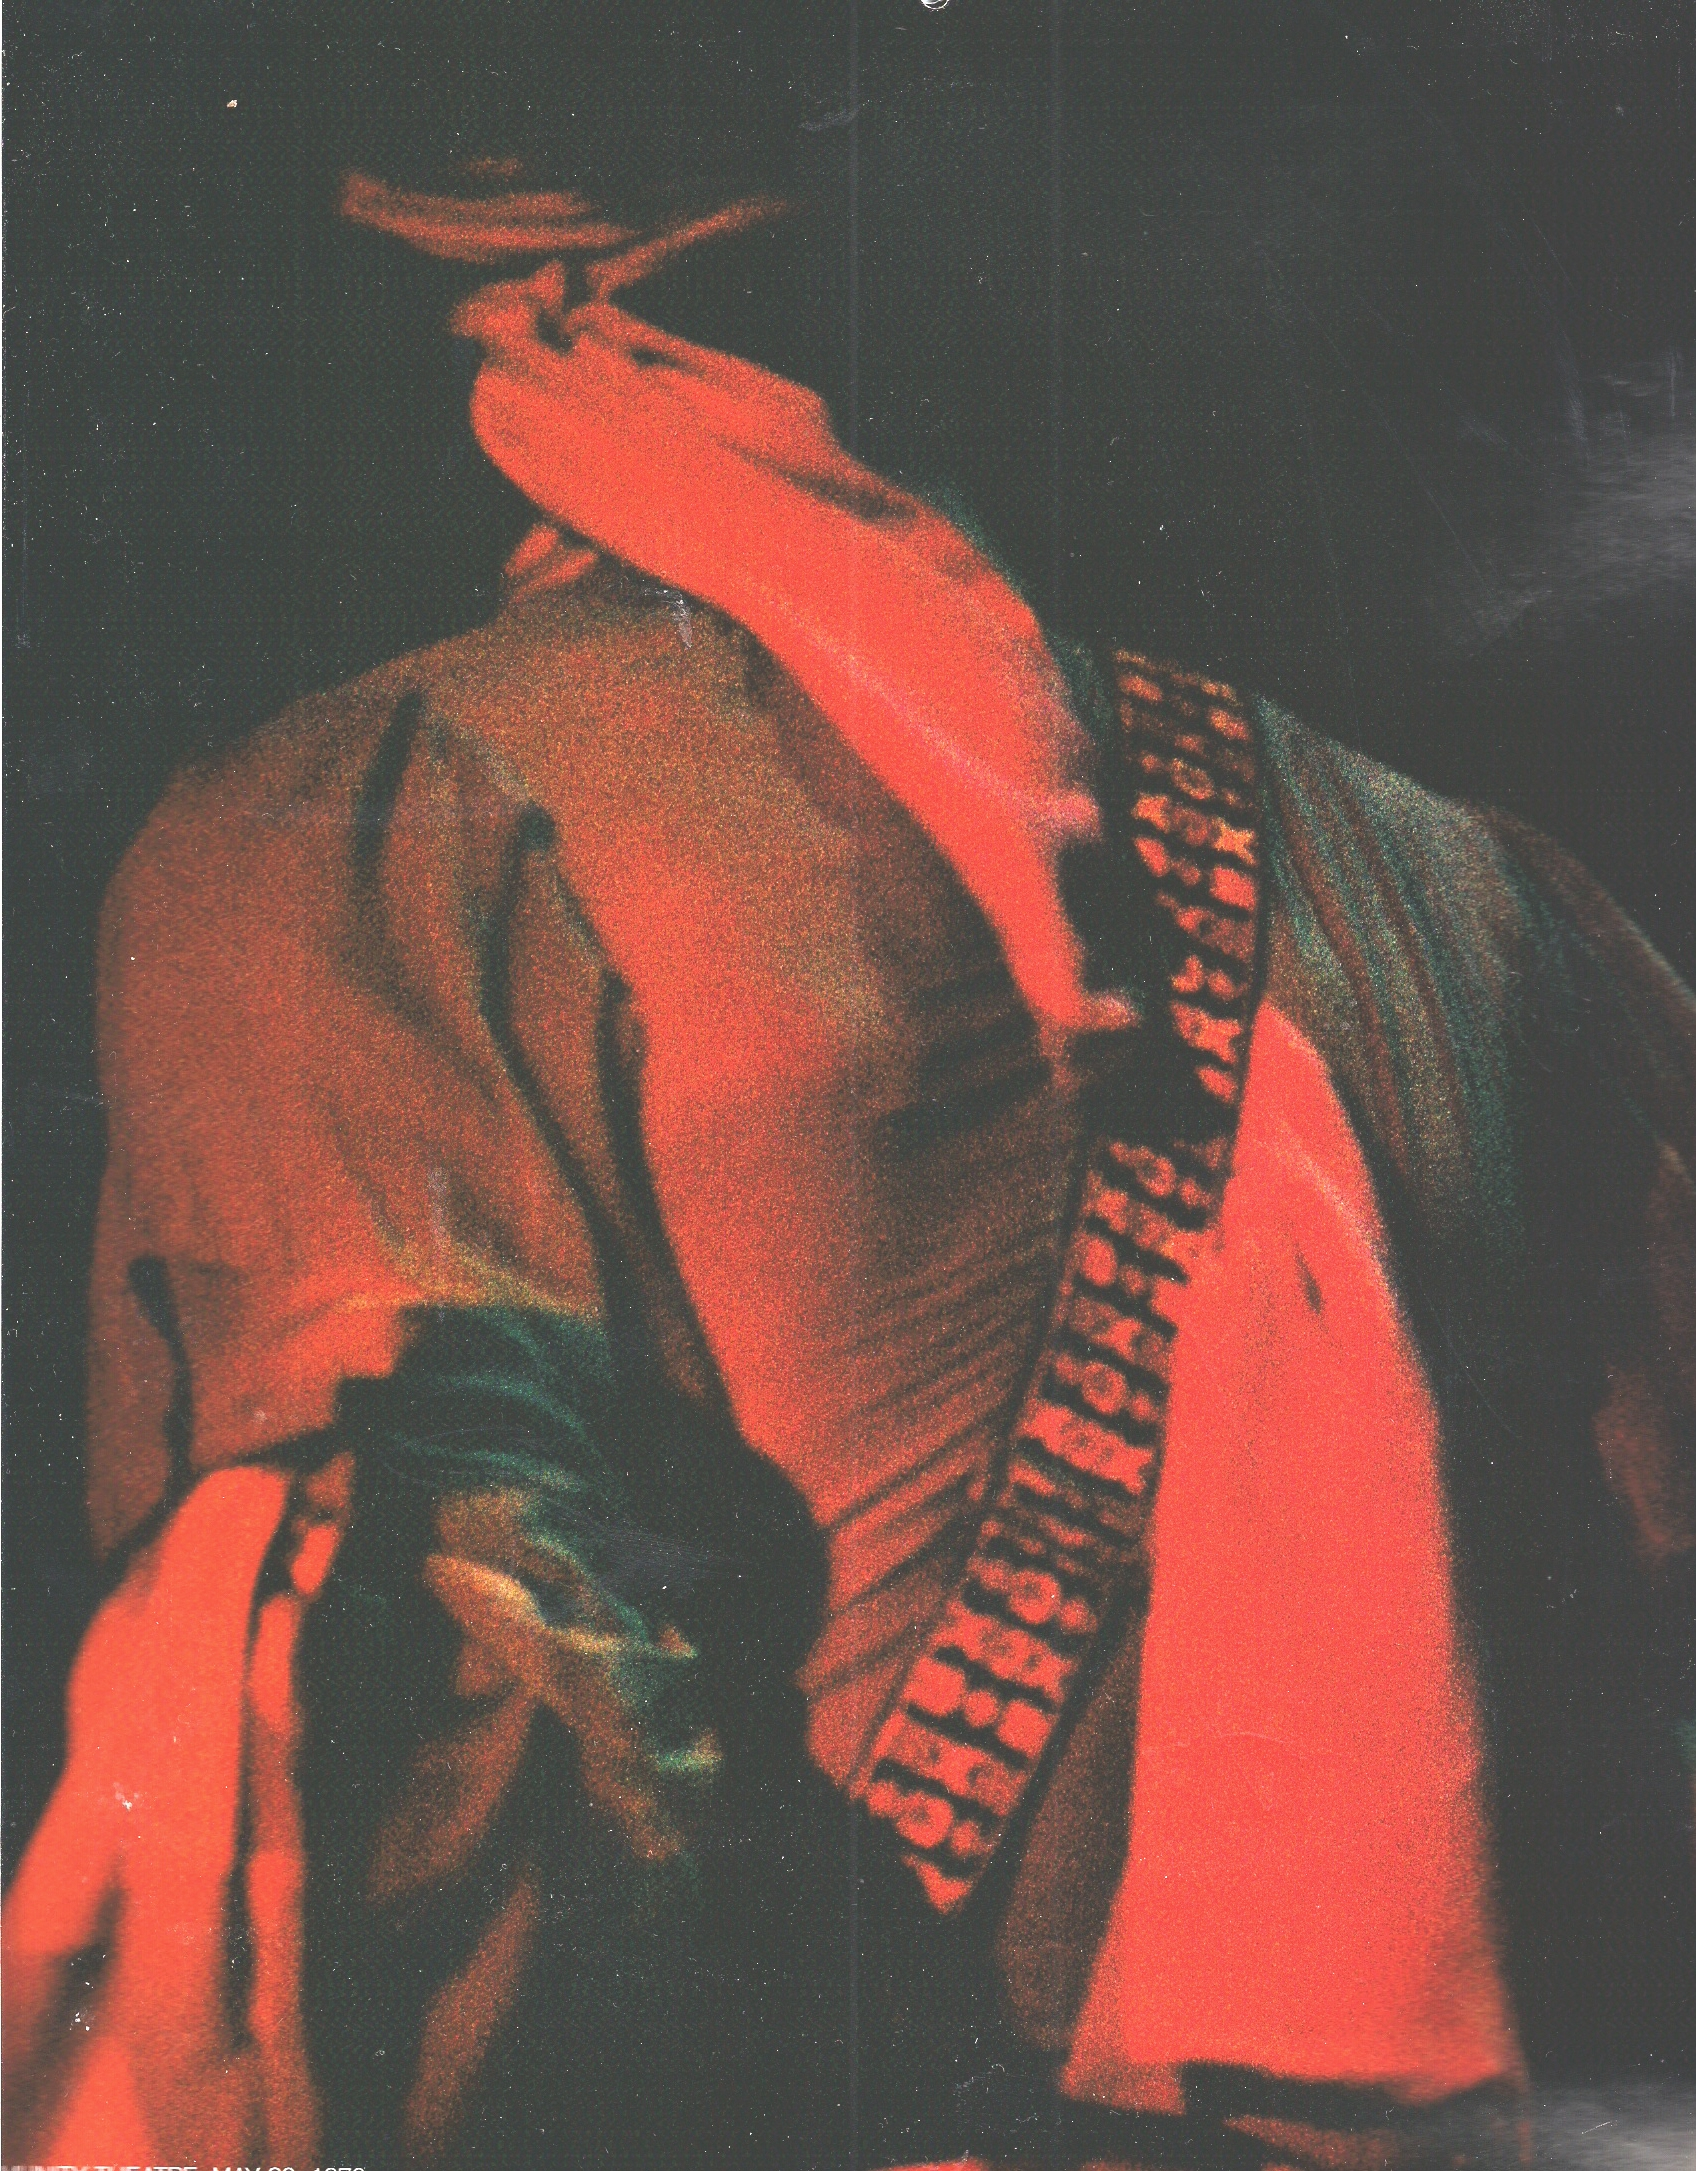 Live At Berkeley (2003) F2baa50d9a2a83685c730a9d12e9e15b